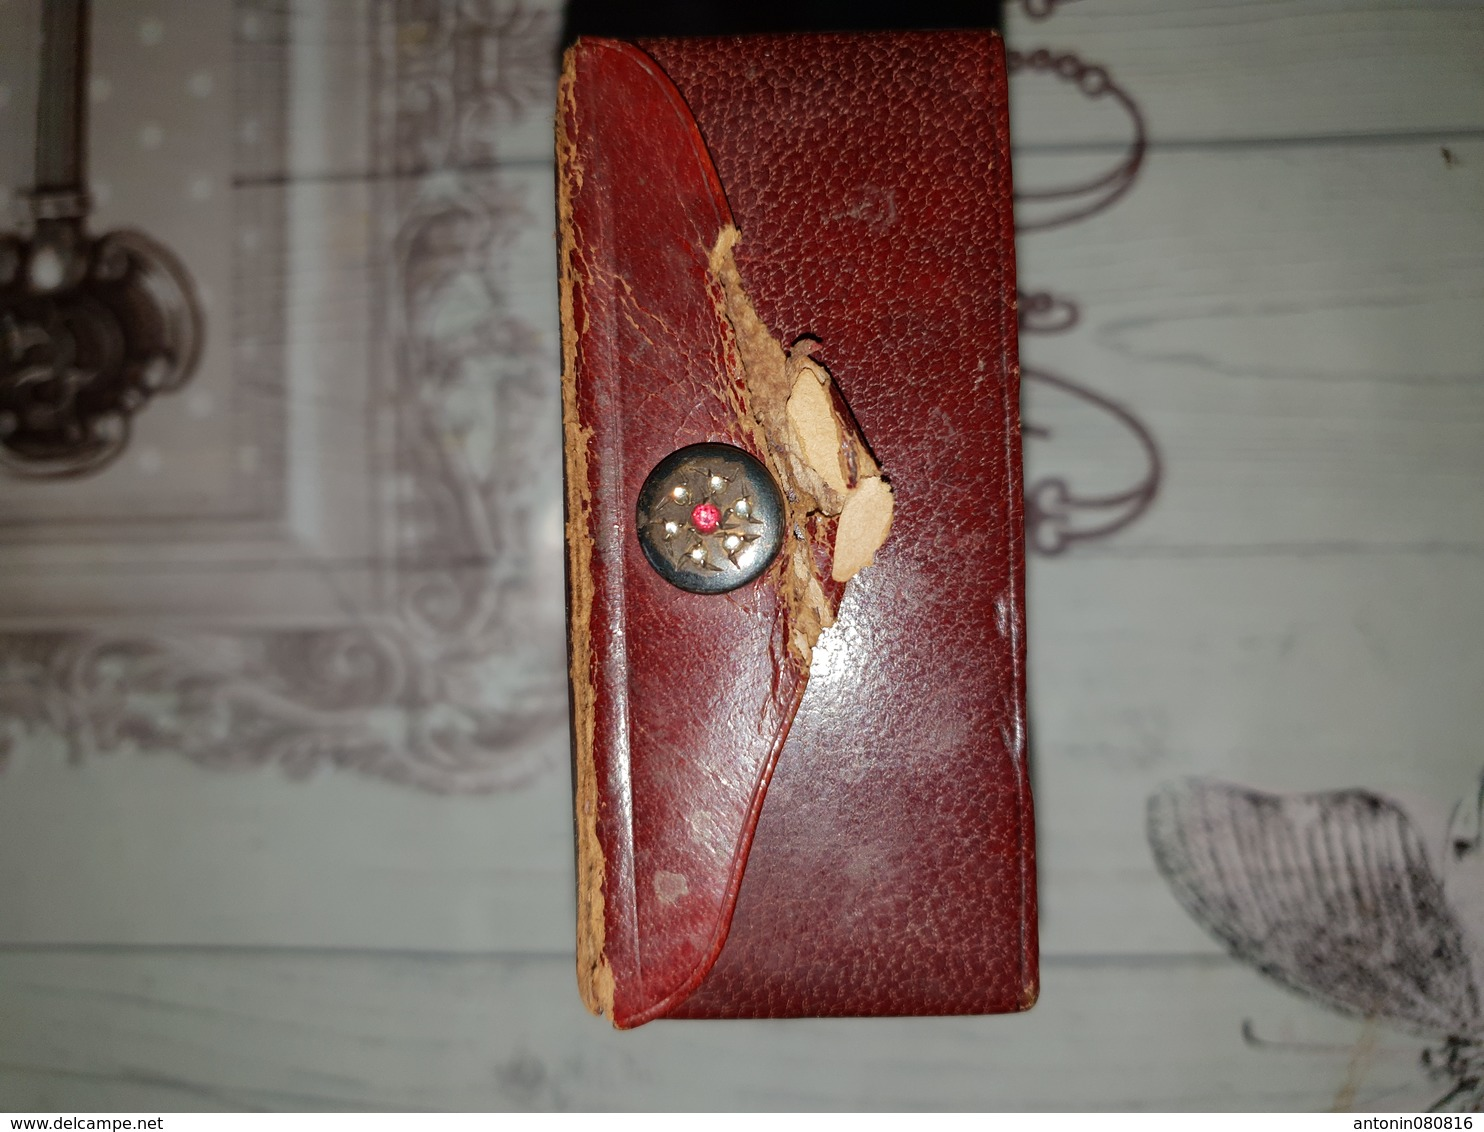 Rare Boite De Parfum Coty En Cuir - Miniature Bottles (in Box)